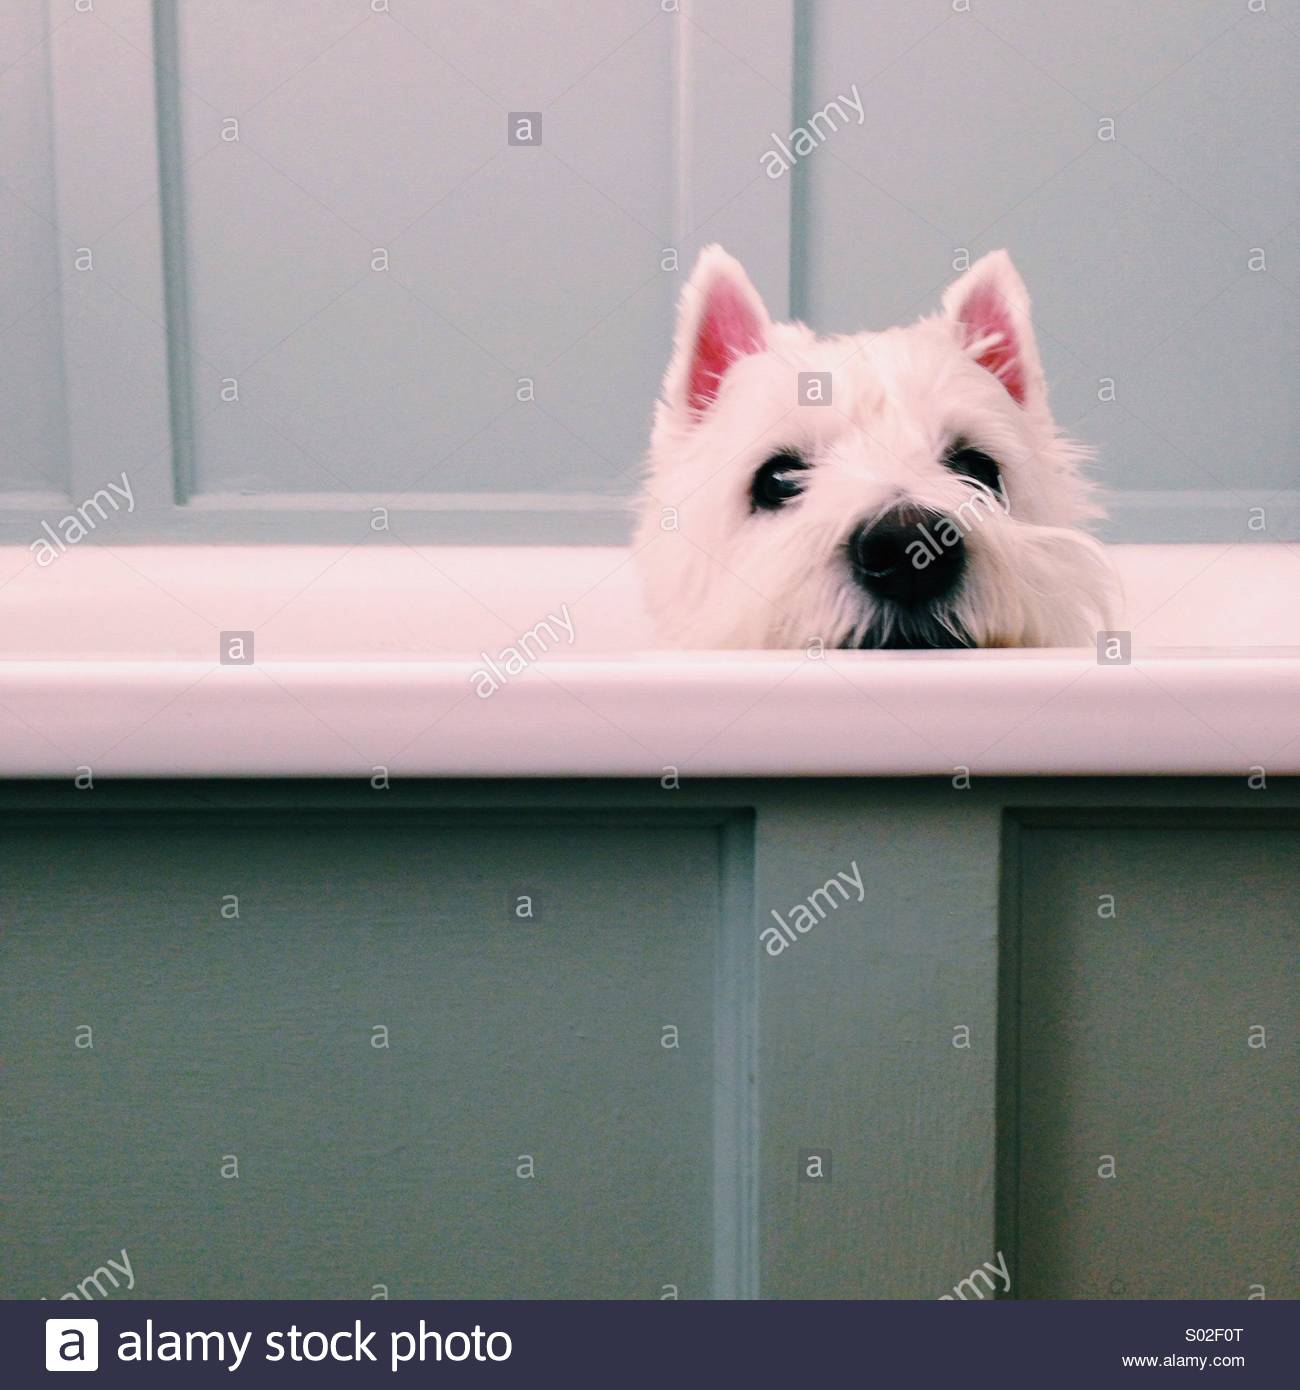 Mac in the bath 7 - Stock Image